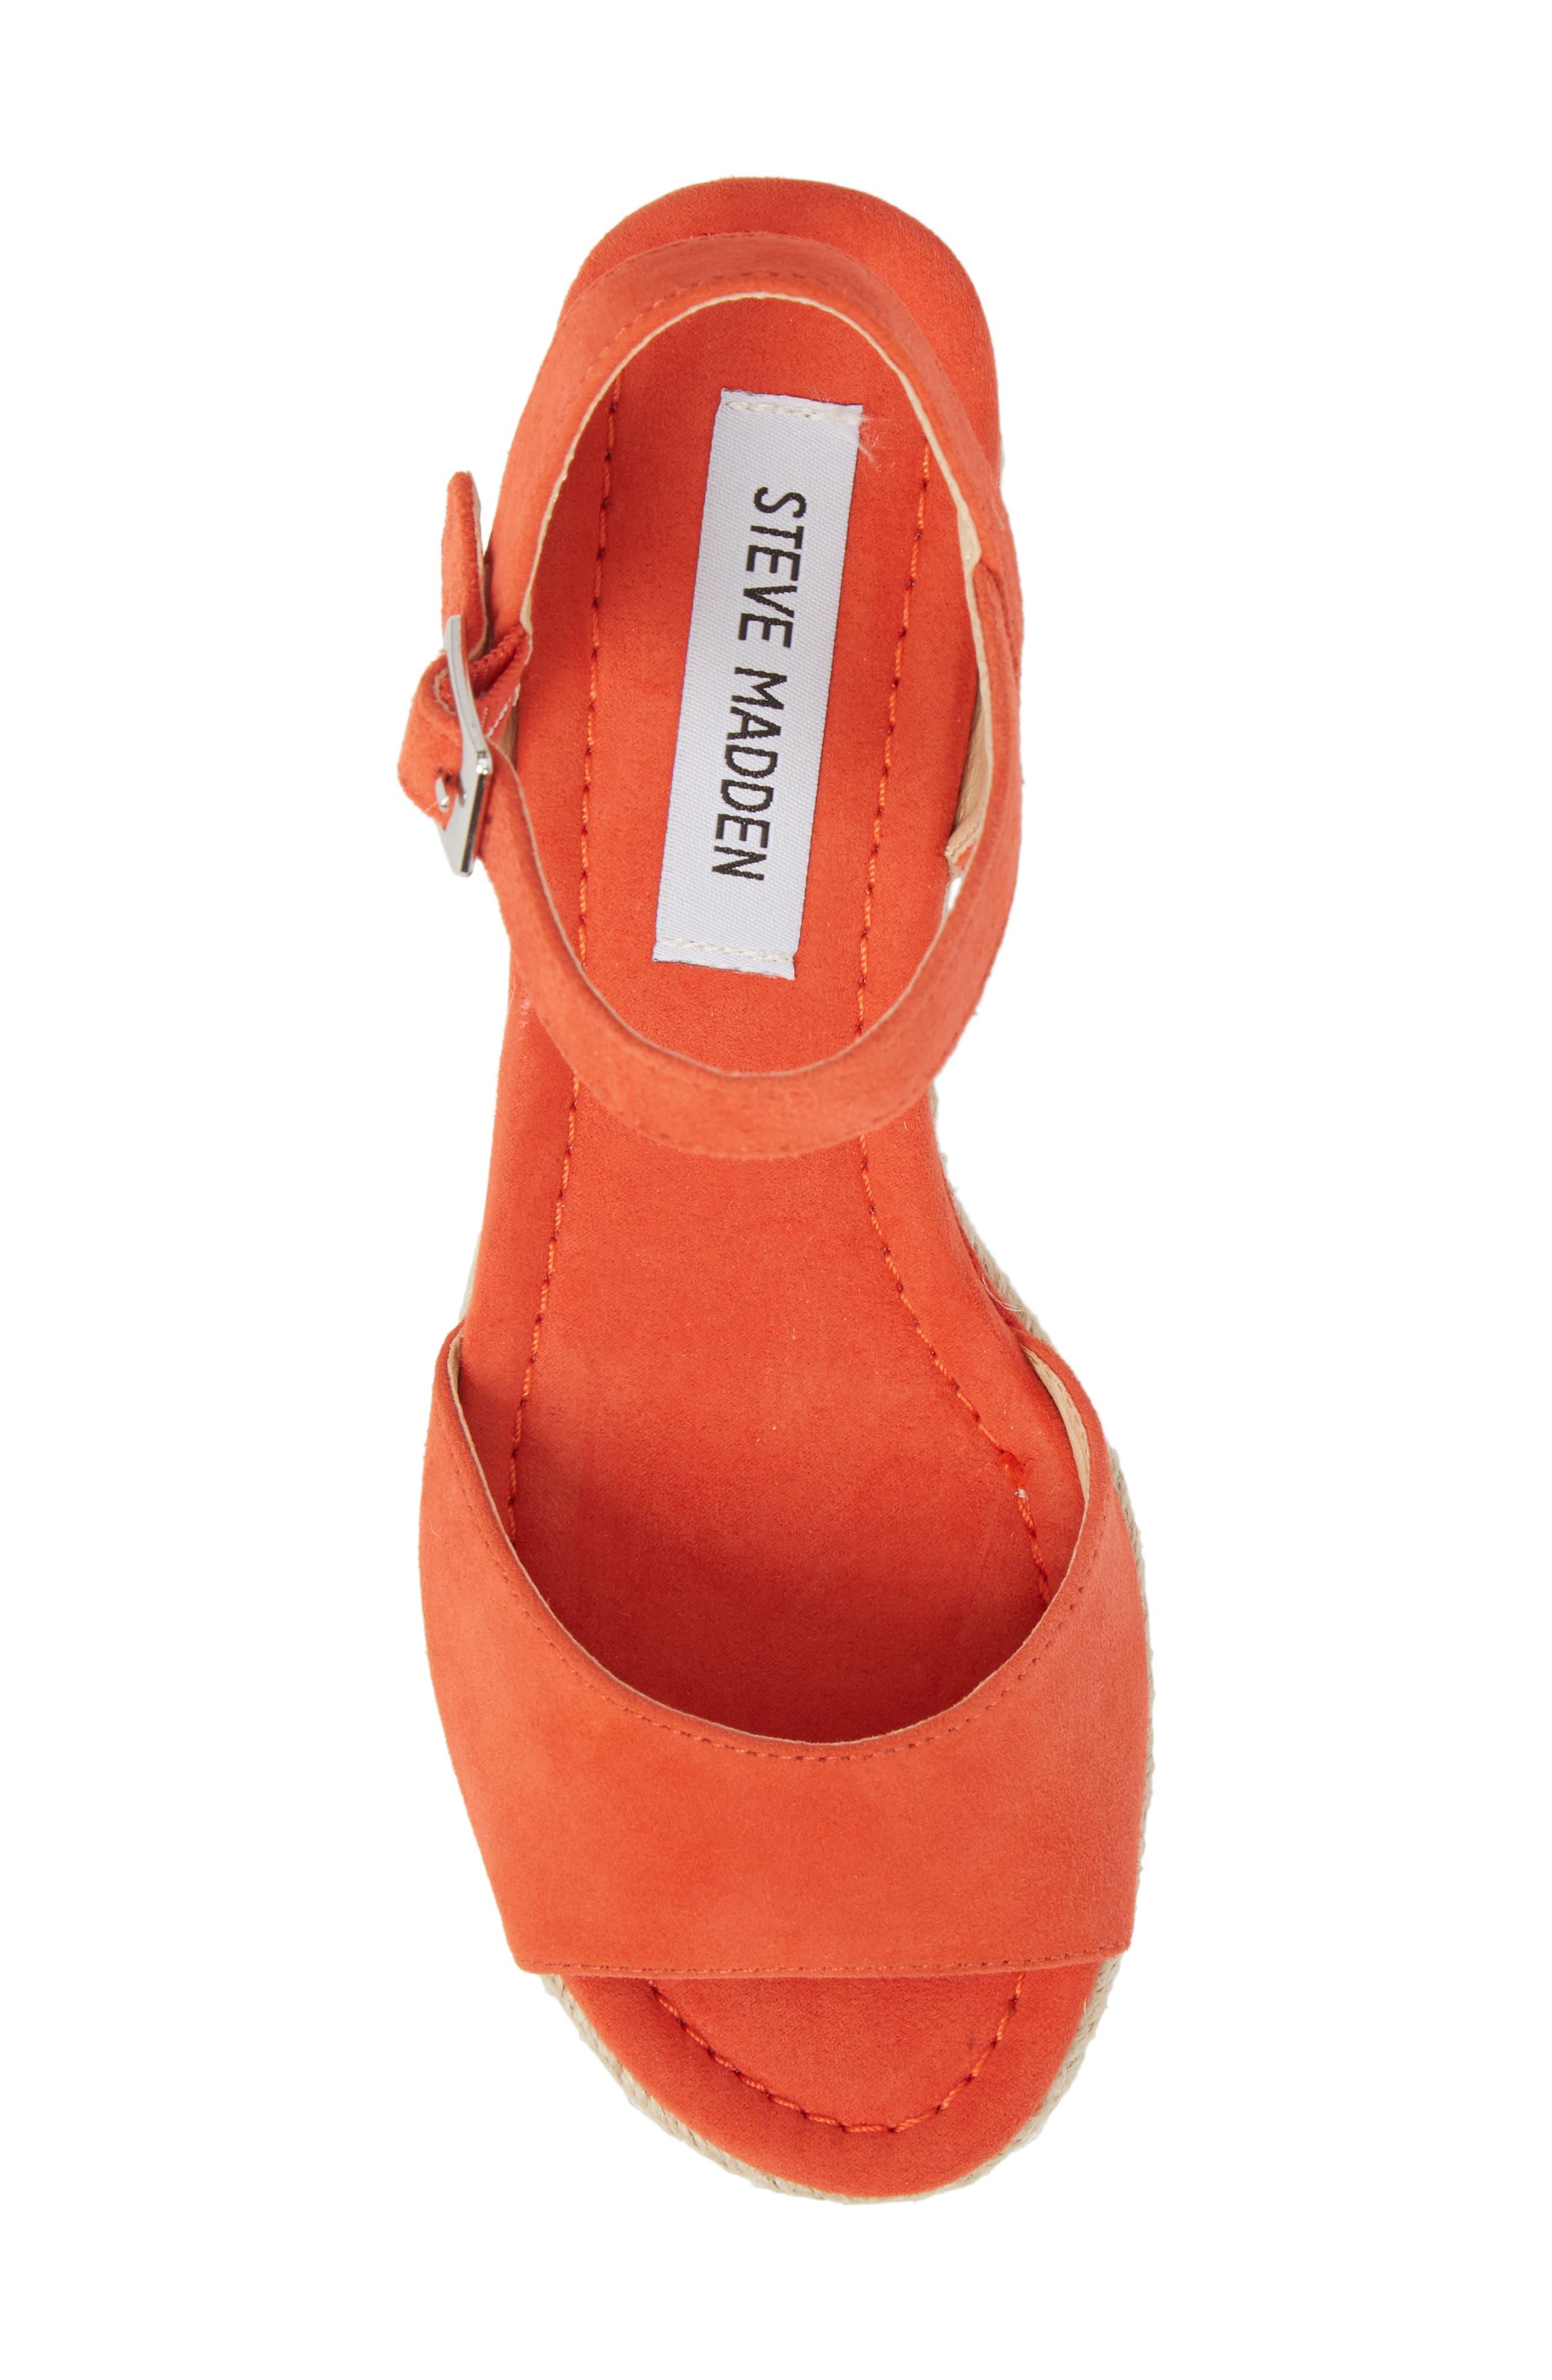 Kianna Espadrille Wedge Sandal,                             Alternate thumbnail 5, color,                             Coral Suede